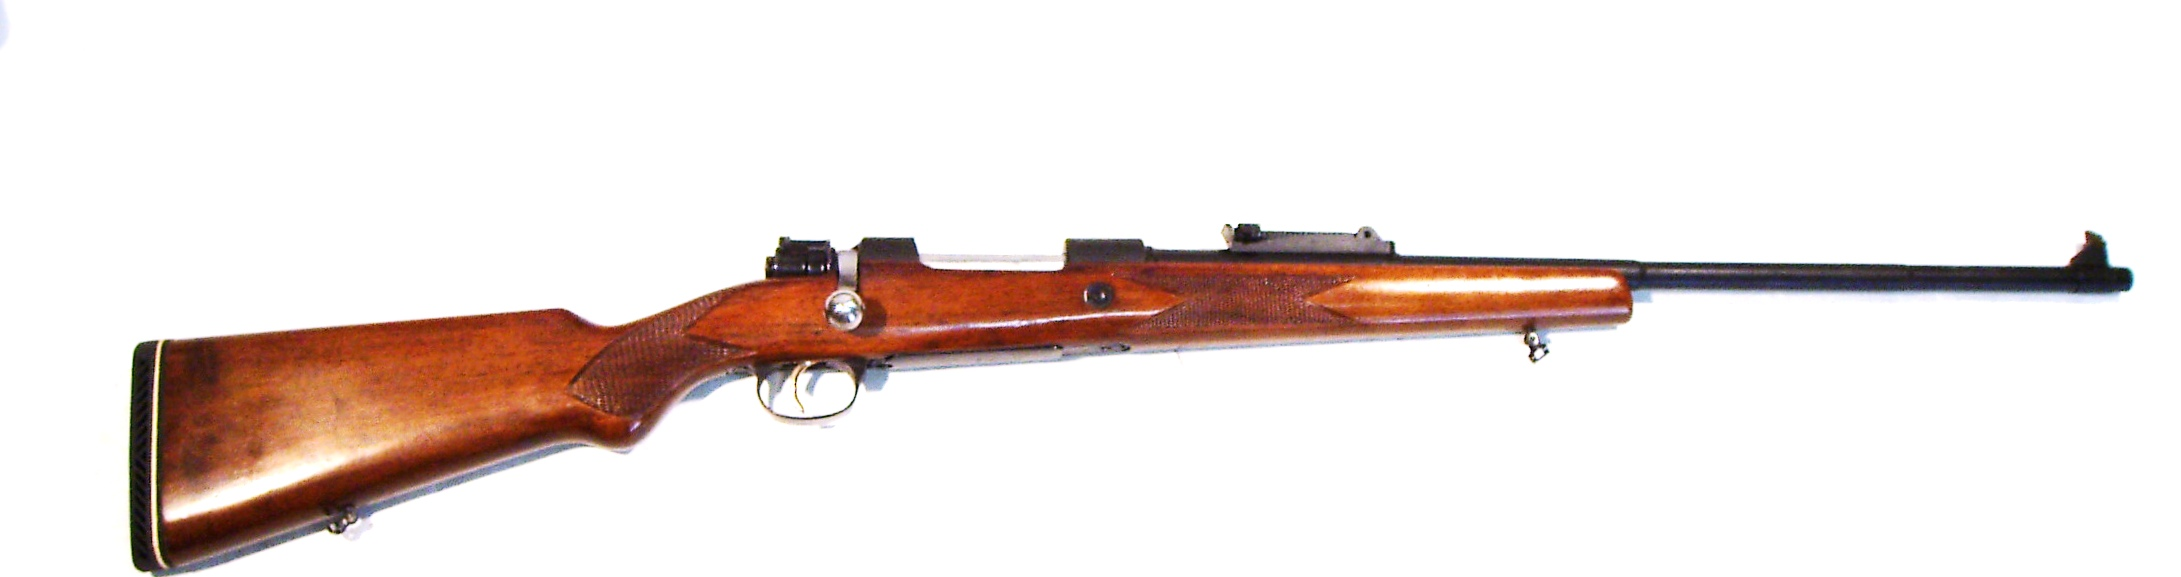 Fusil FN HERSTAL (KETT), modelo K98, calibre 8 mm. (8x57JS), nº E1521.-0